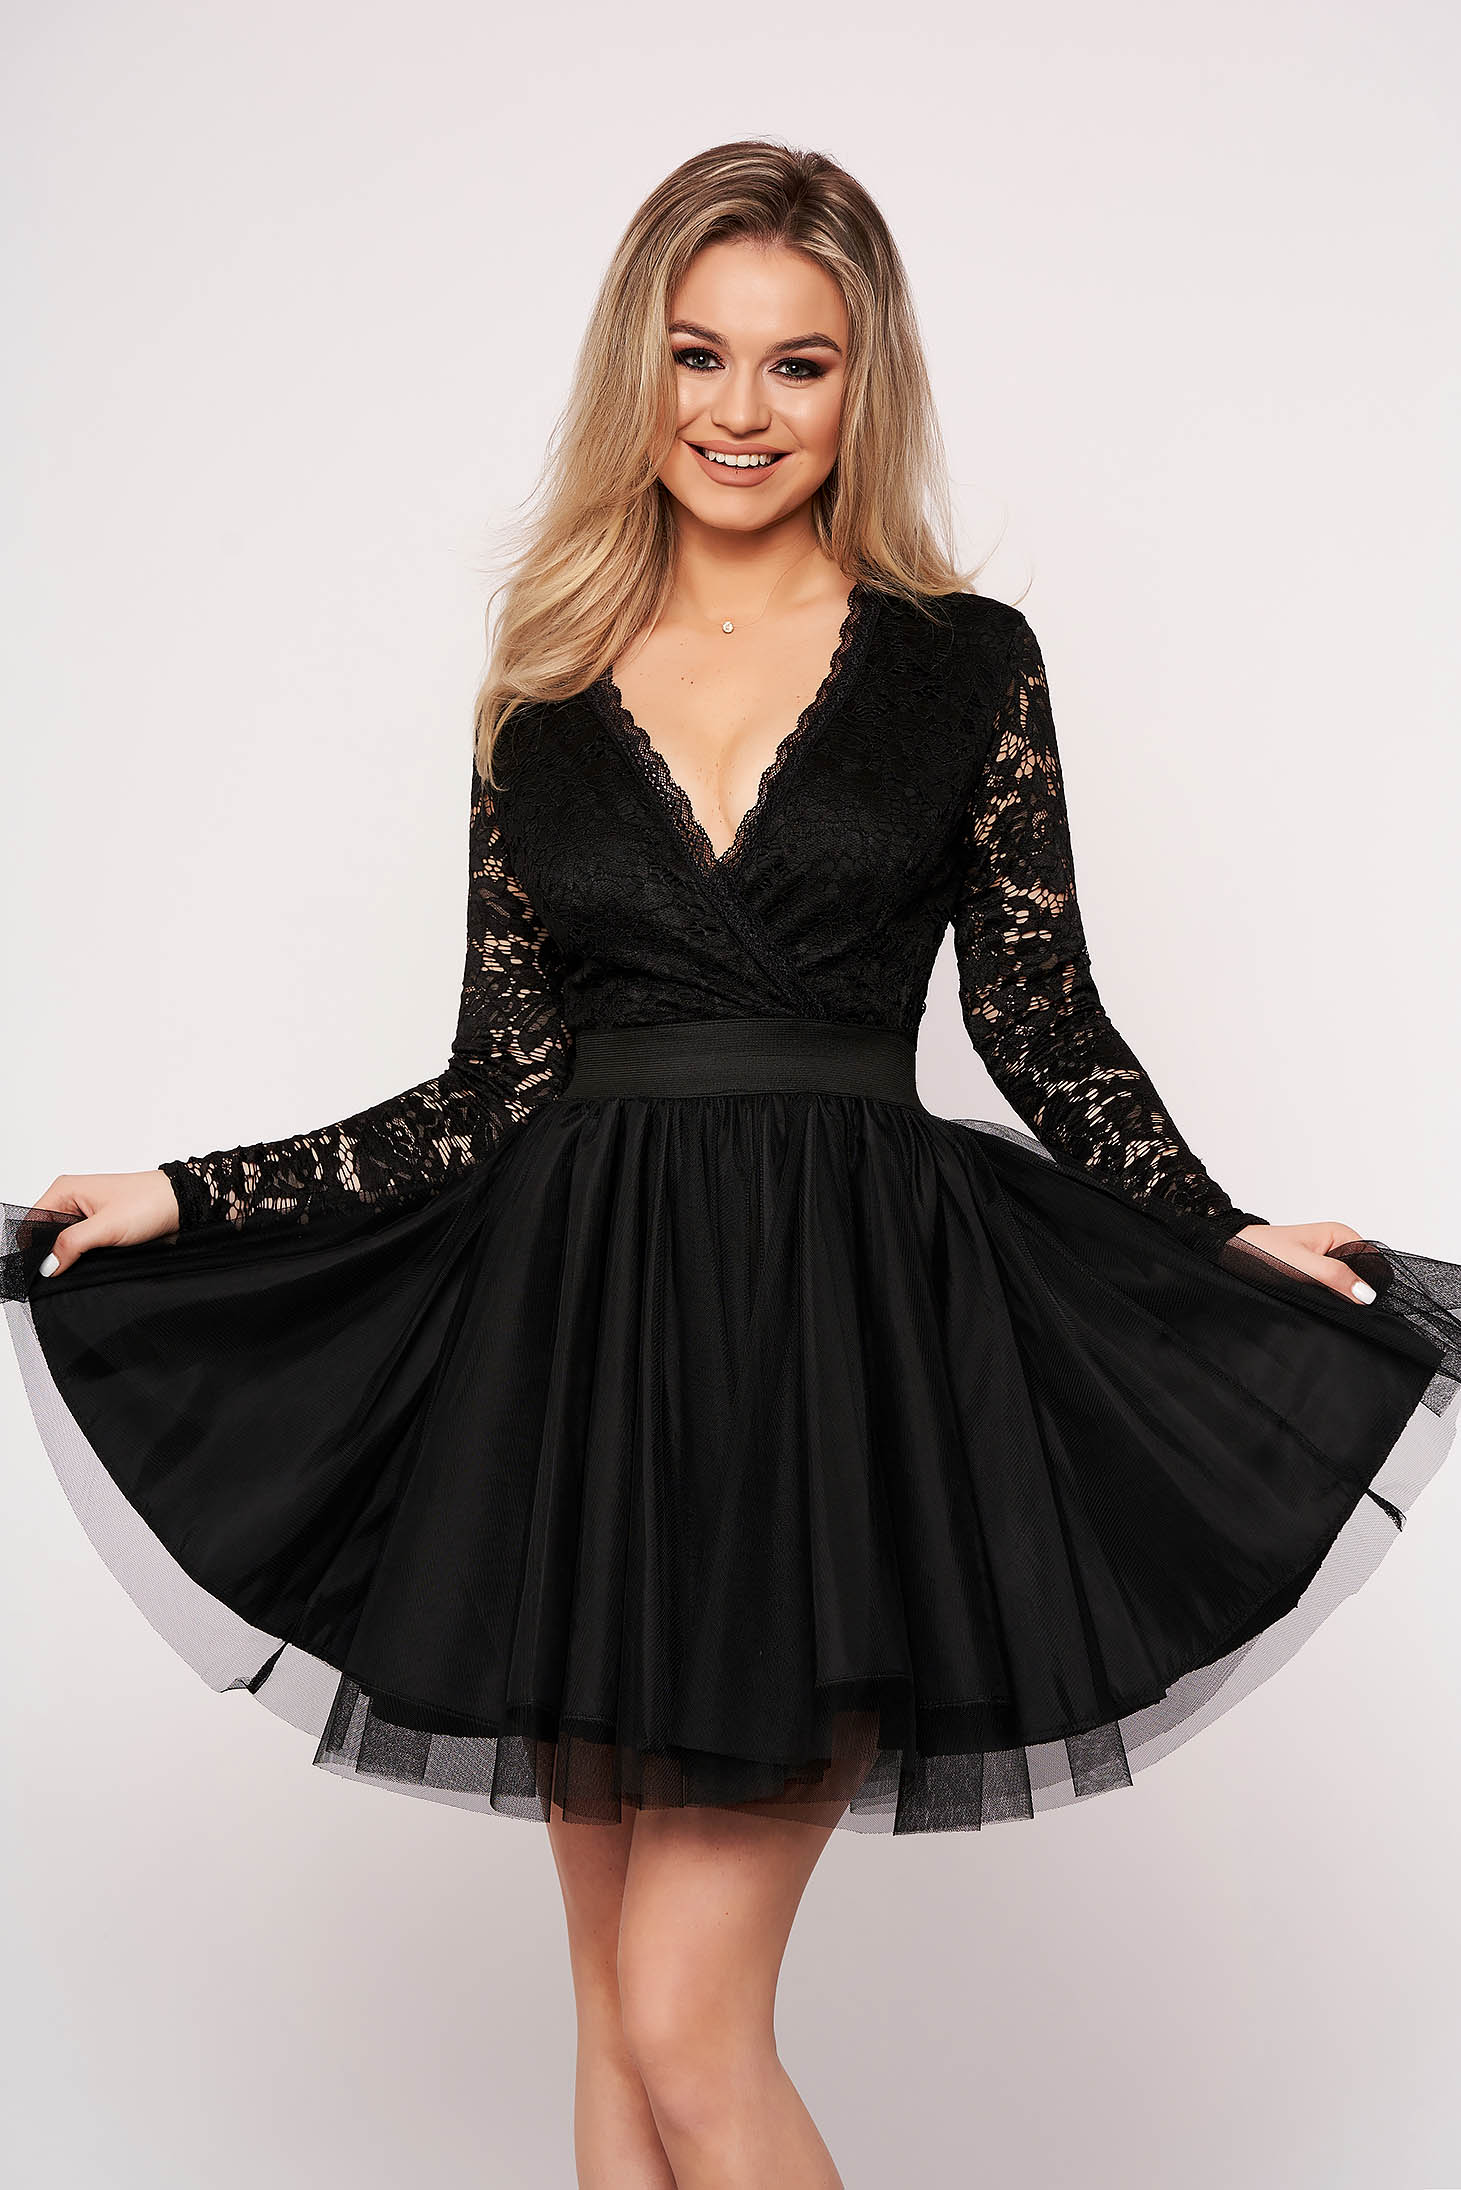 Black dress from tulle cloche elegant with v-neckline